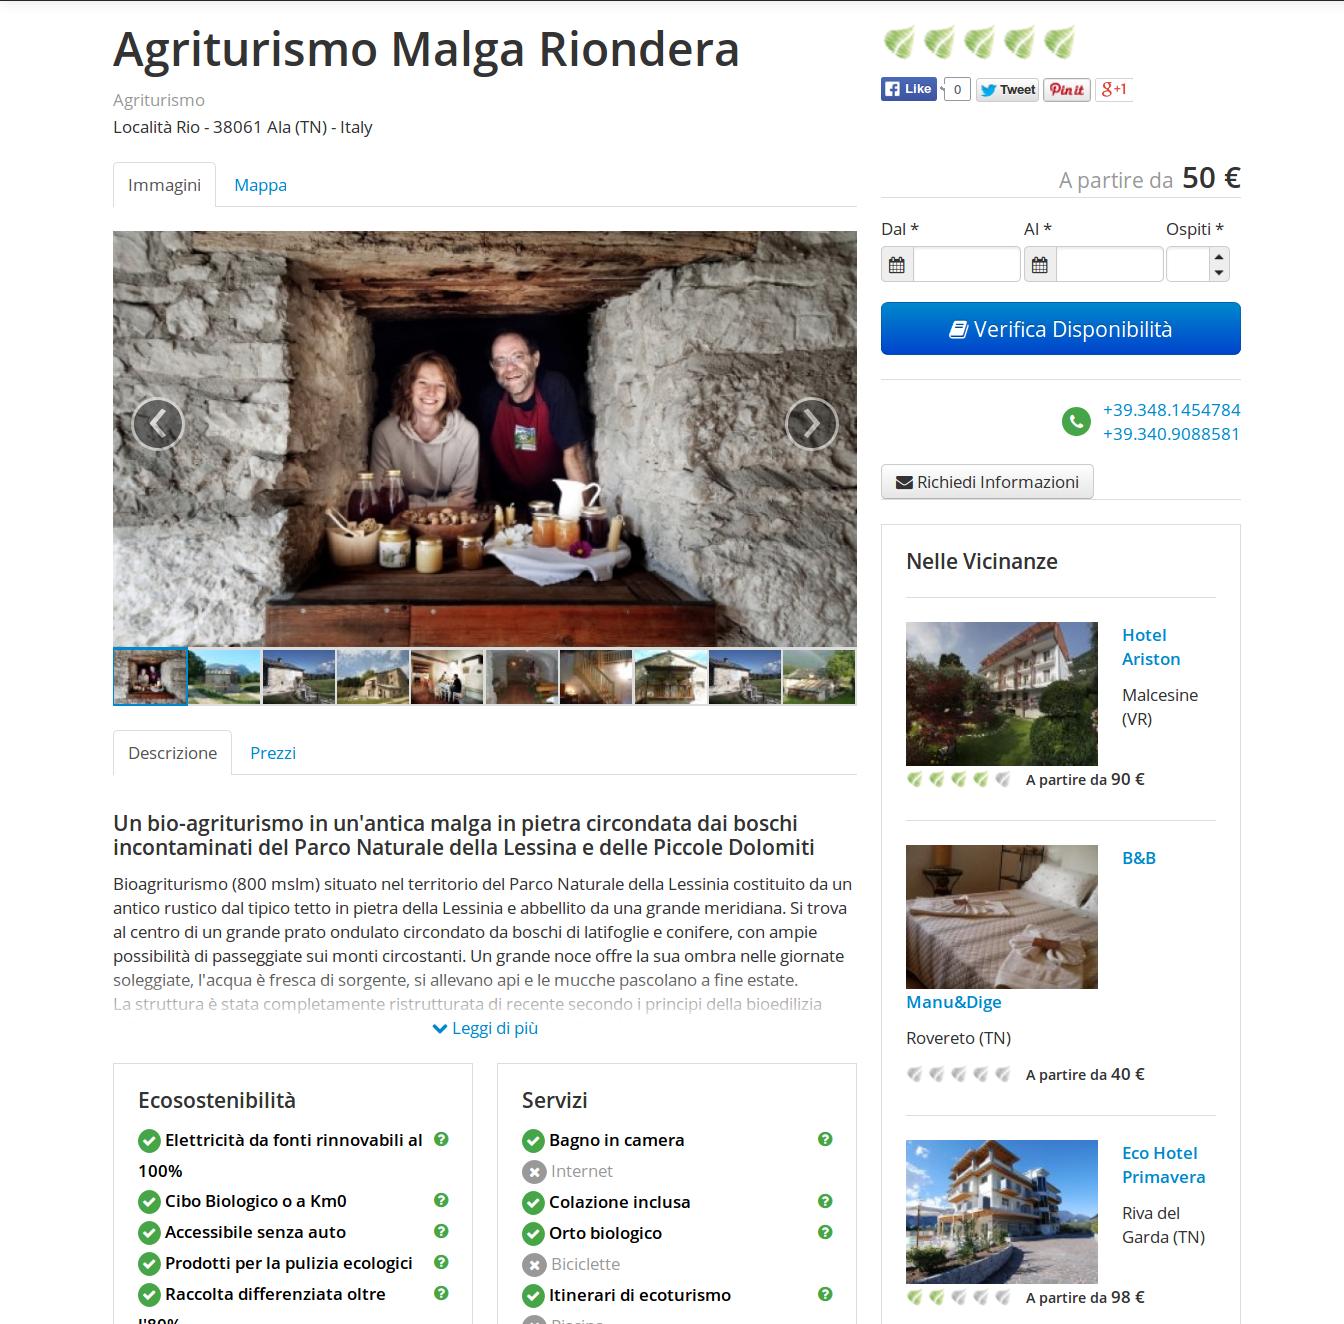 pagina dedicata agli agriturismi ecologici su ViaggiVerdi Ecobnb.com